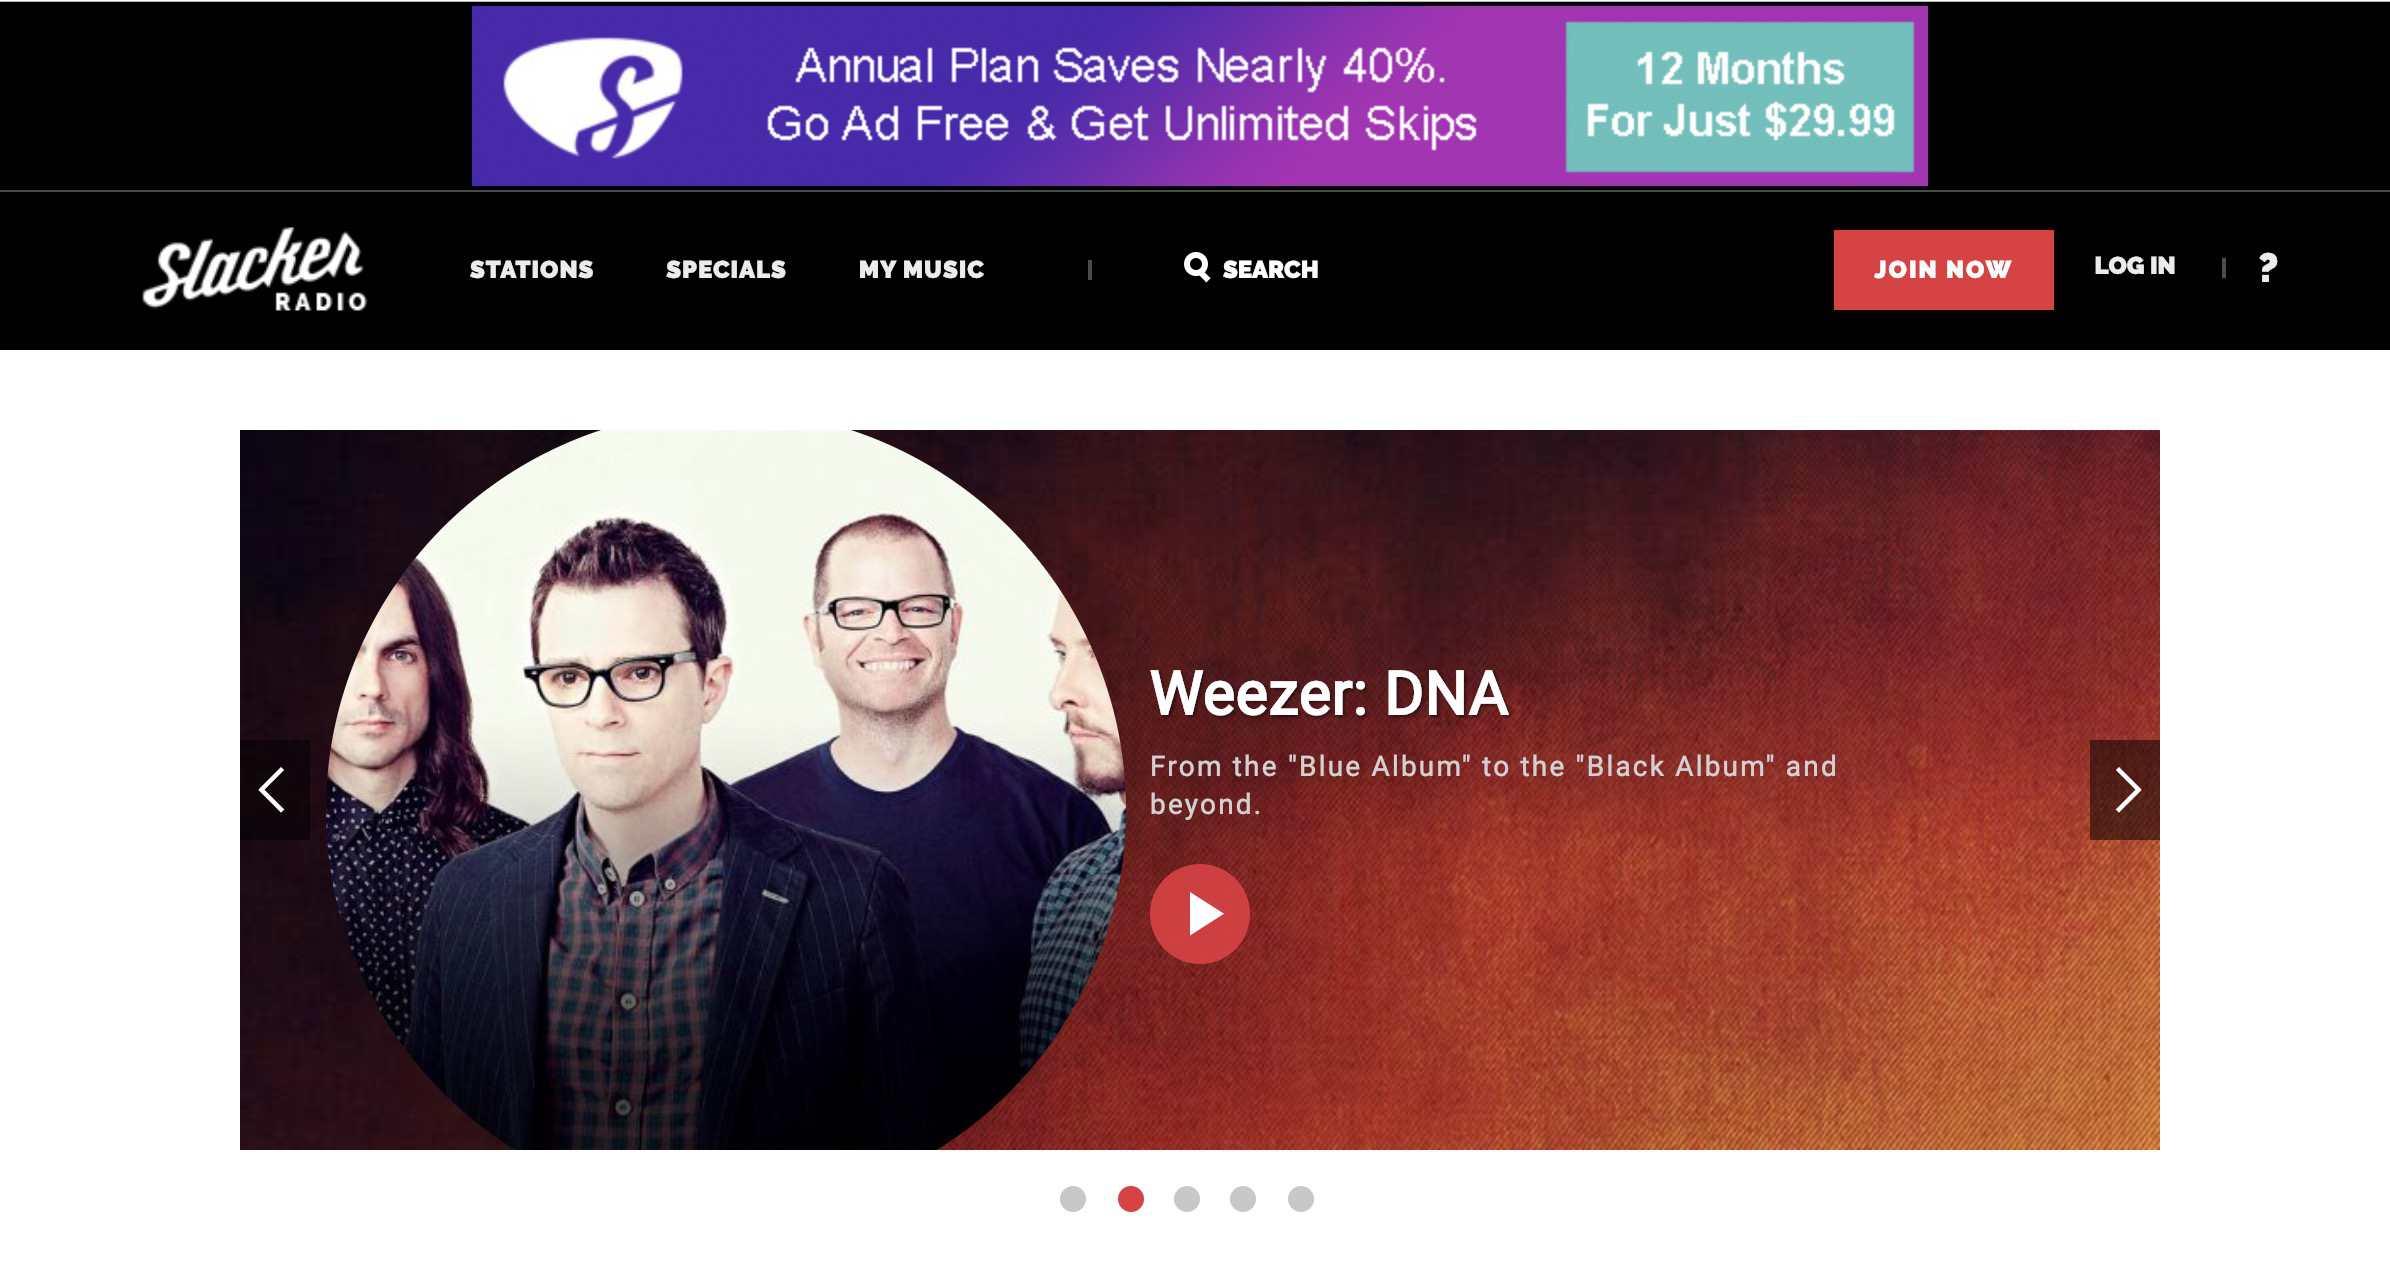 Slacker Radio website